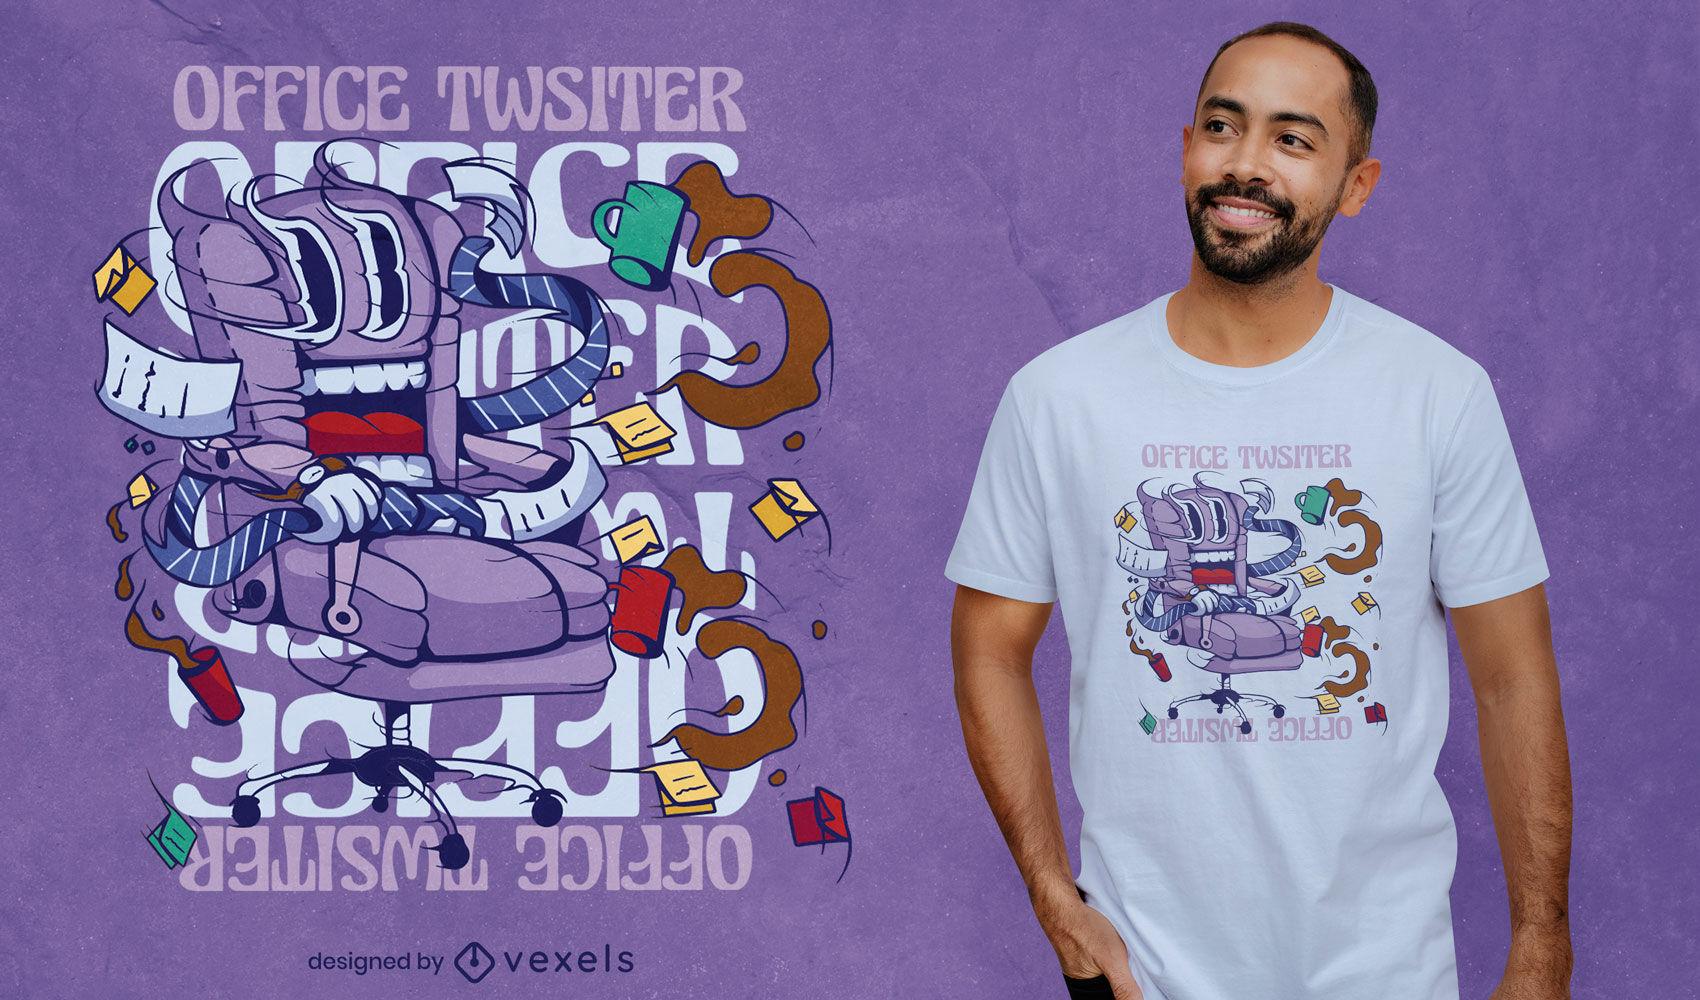 Spooky Office twister t-shirt design